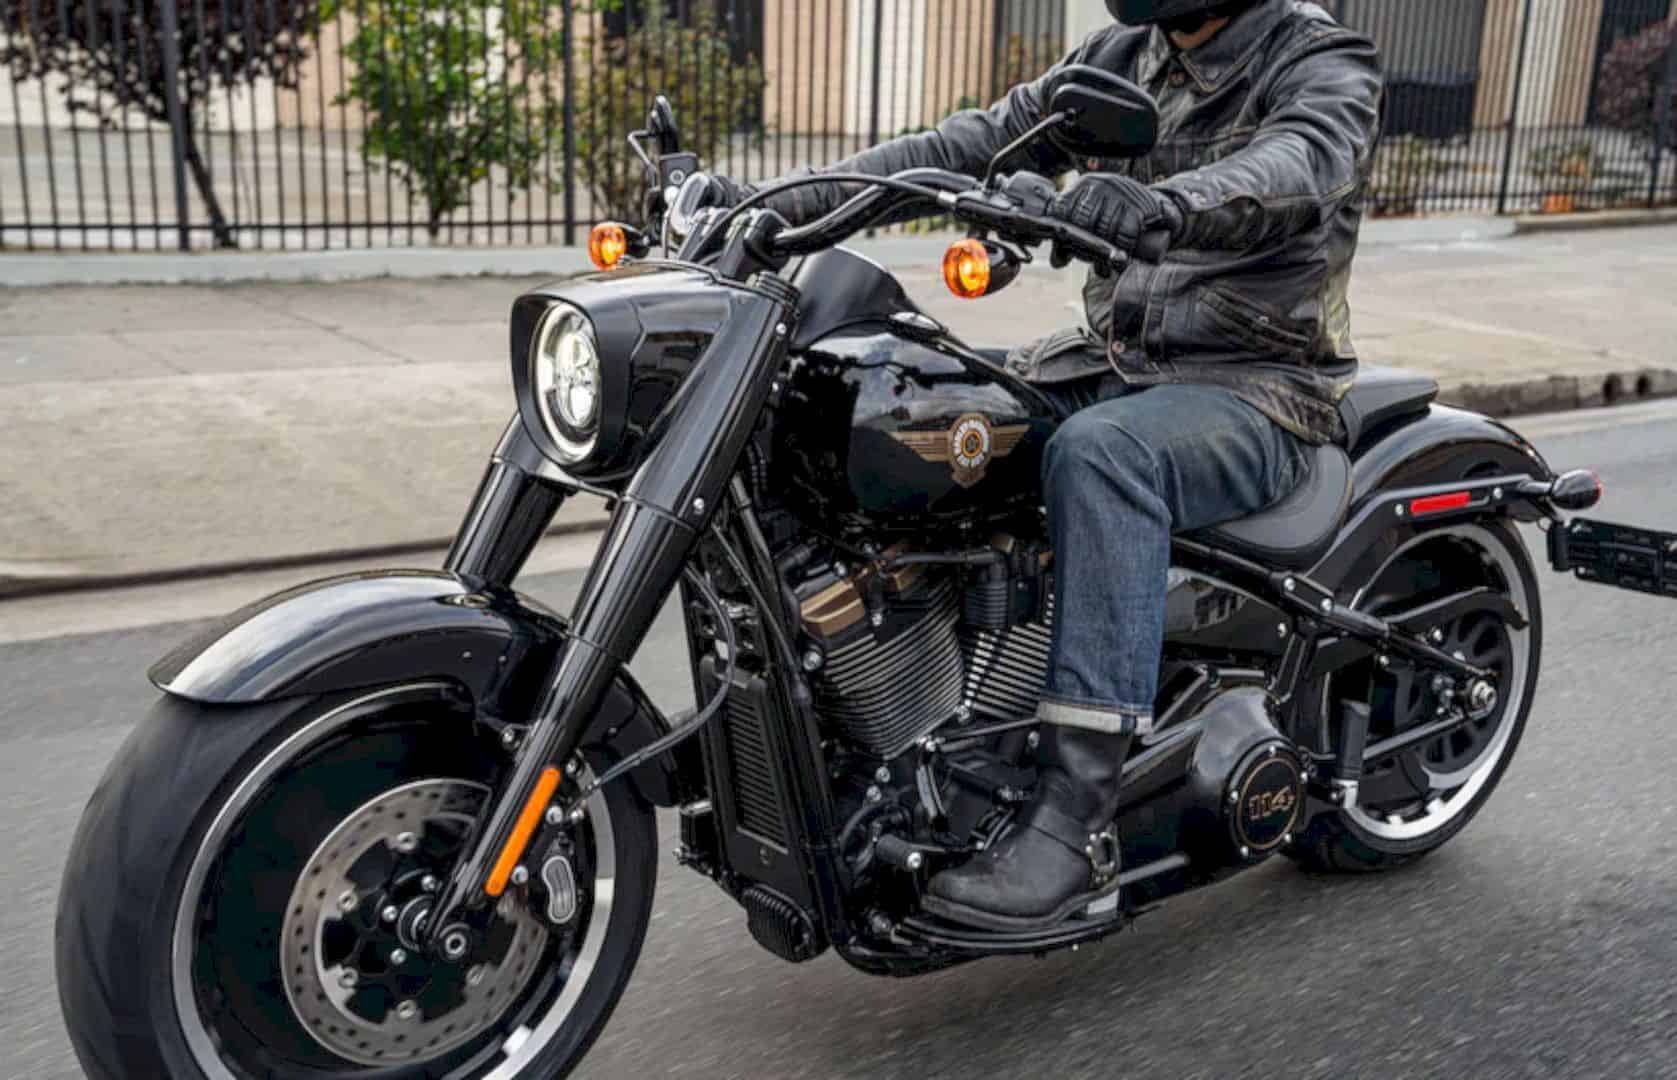 Harley Davidson 2020 Fat Boy® 114 Motorcycle 1